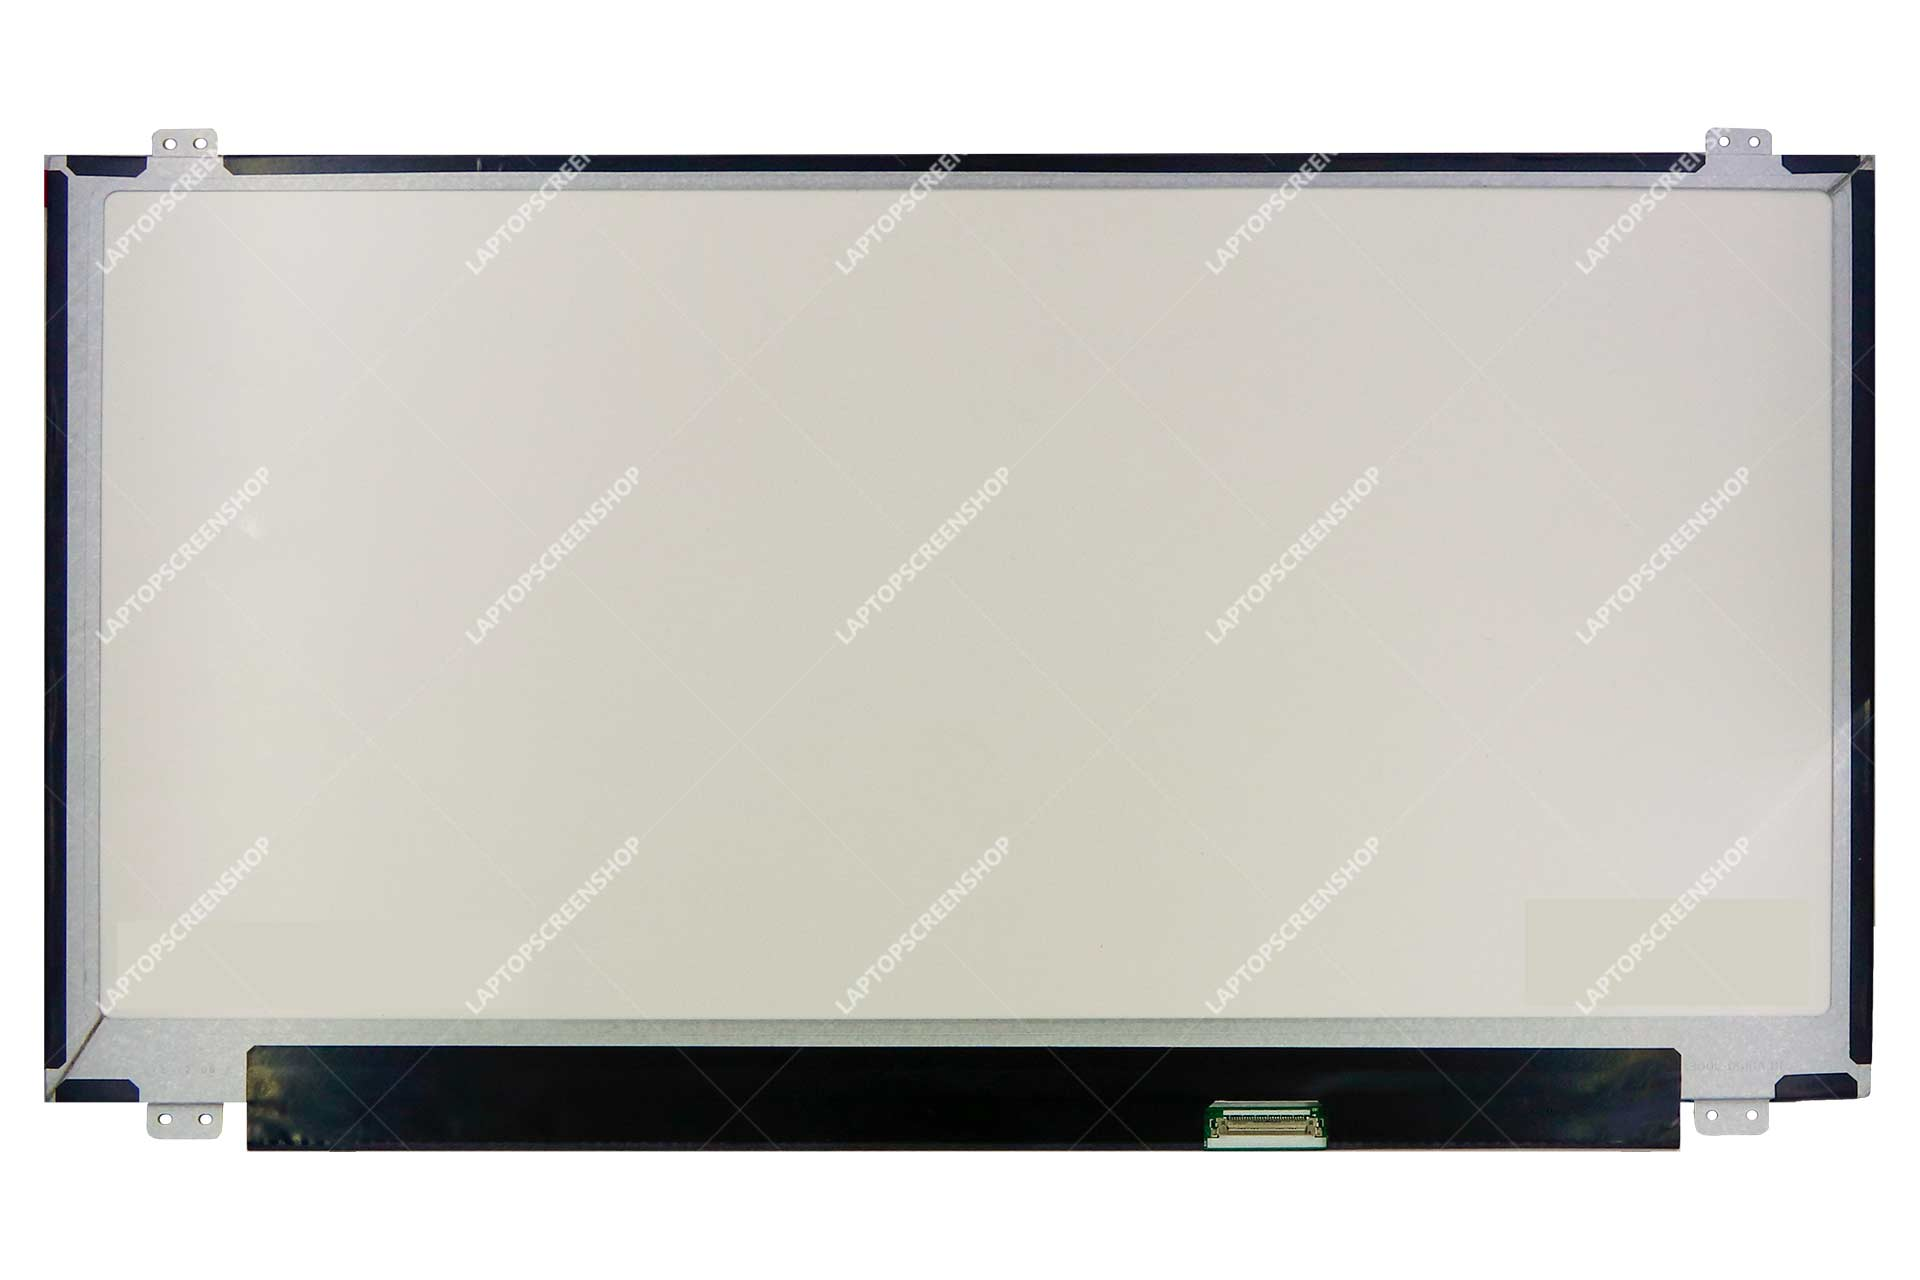 ACER-ASPIRE-E1-472-6688-LCD |HD|فروشگاه لپ تاپ اسکرين | تعمير لپ تاپ